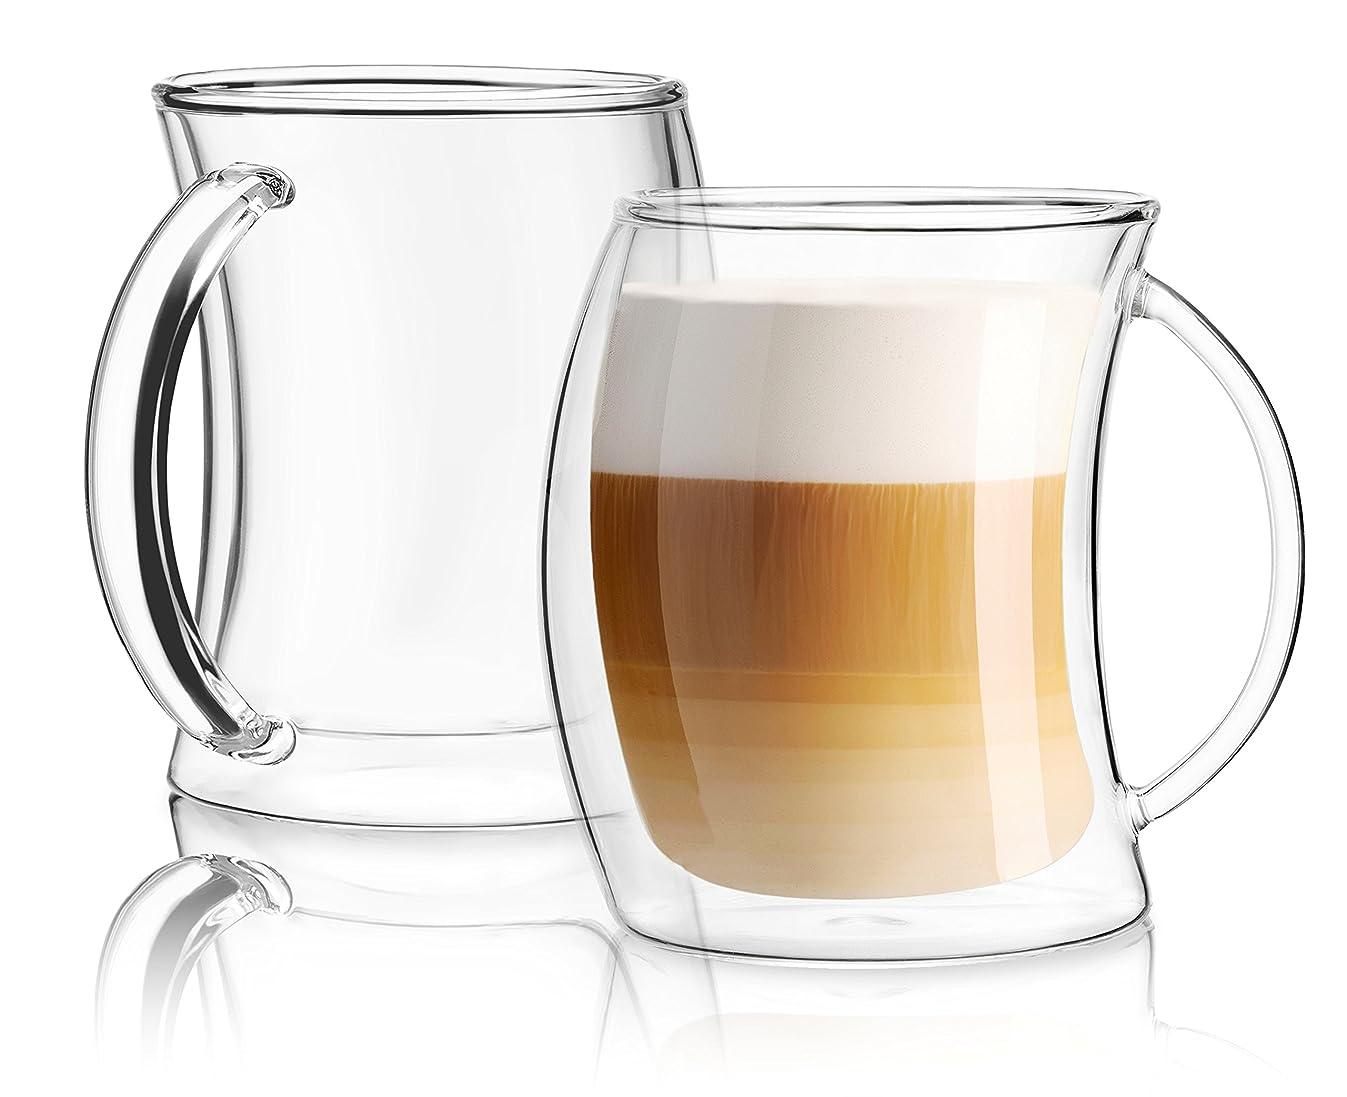 JoyJolt Caleo Collection Glass Coffee Cups Double Wall Insulated Mugs Set Of 2 (13 oz,390ml)